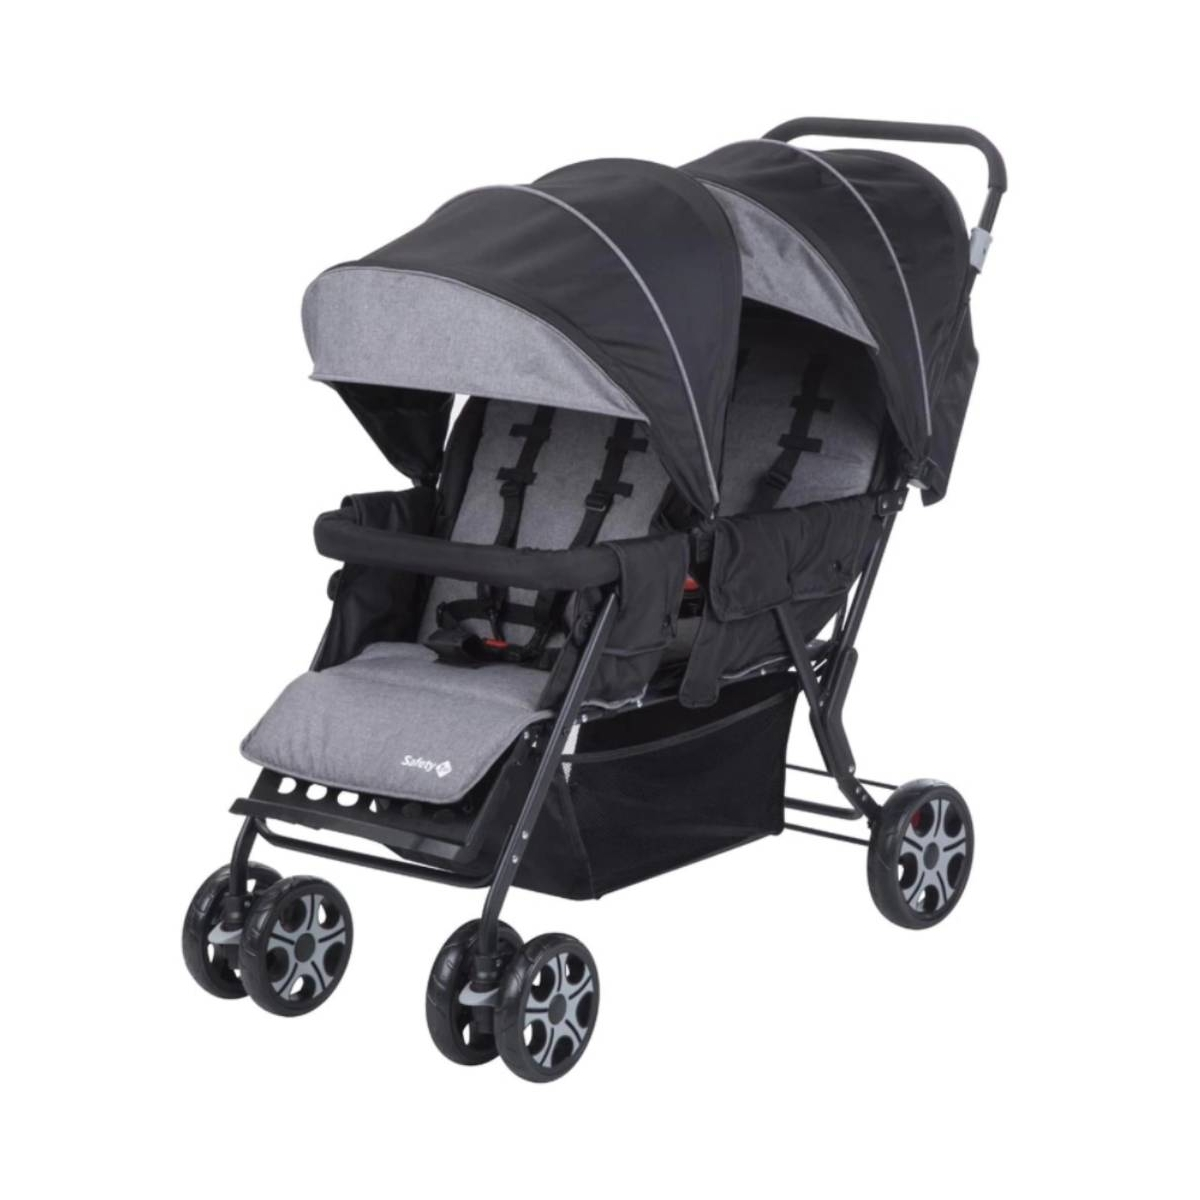 Safety 1st Teamy Stroller-Black Chic (NEW 2021)